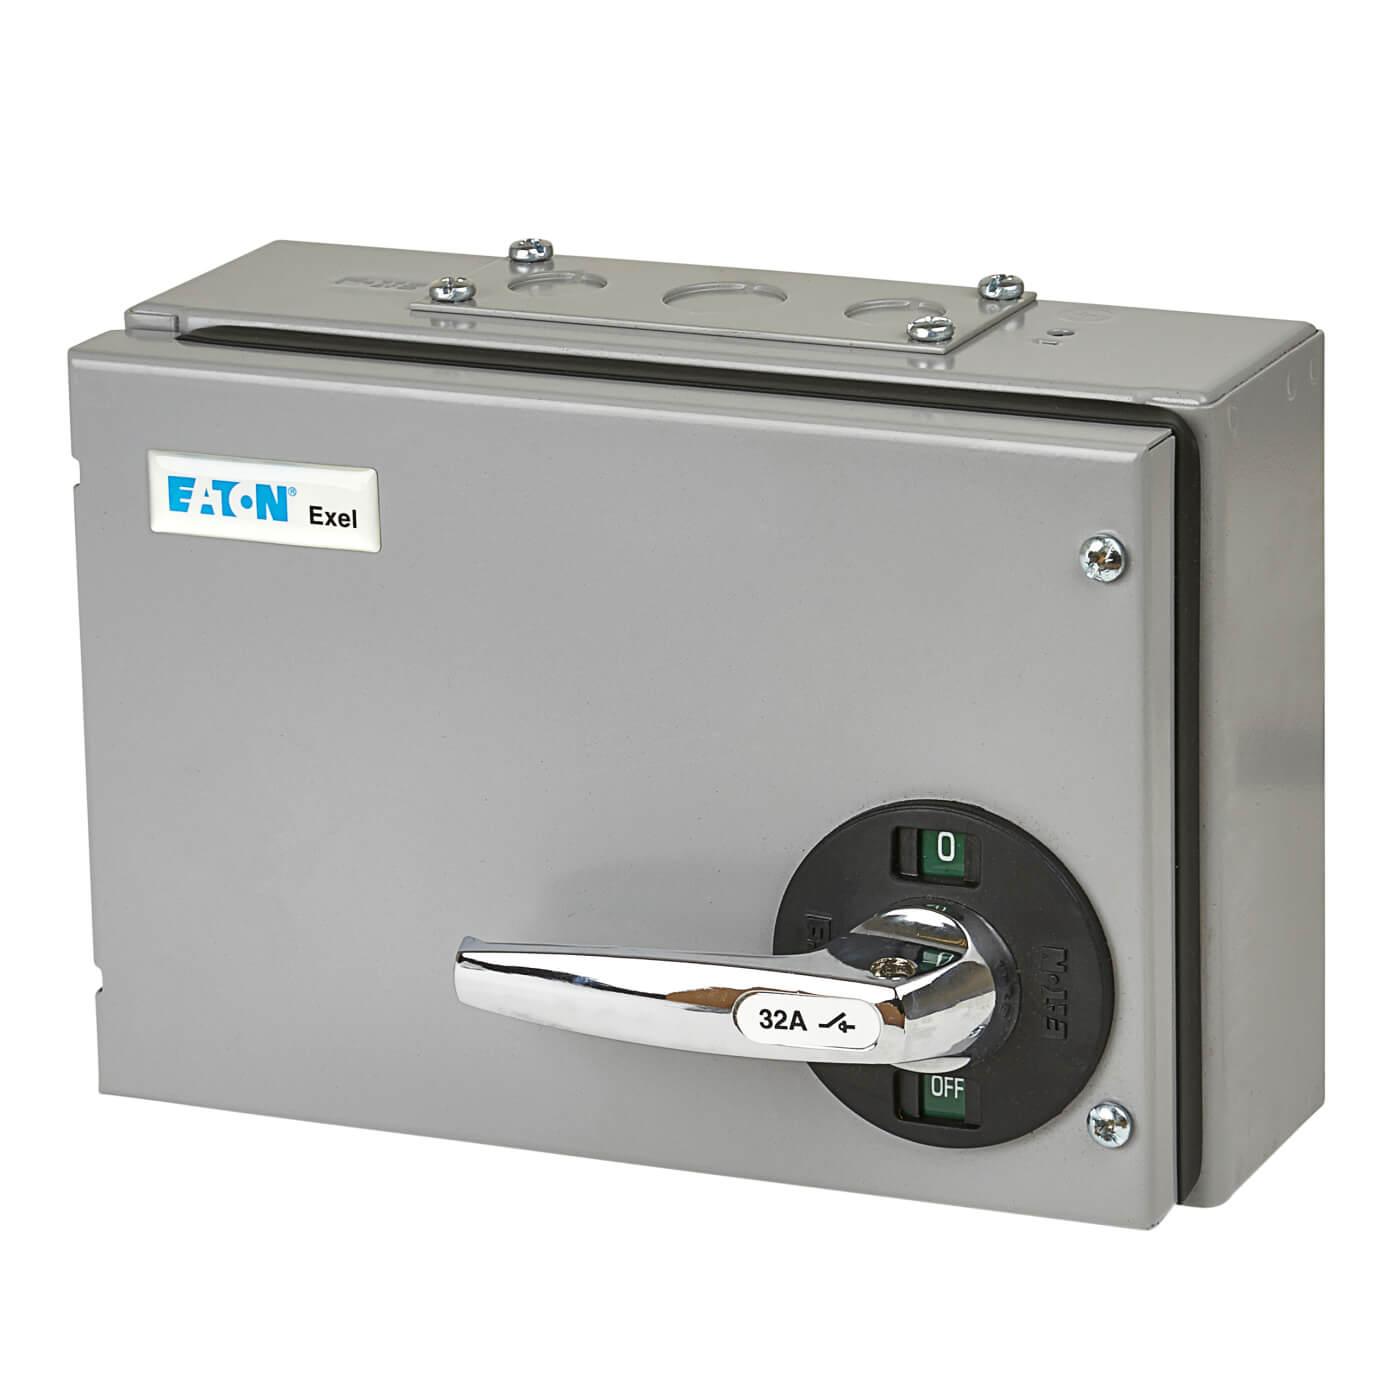 Eaton Mem 32a Tpn Switch Electricaldirect